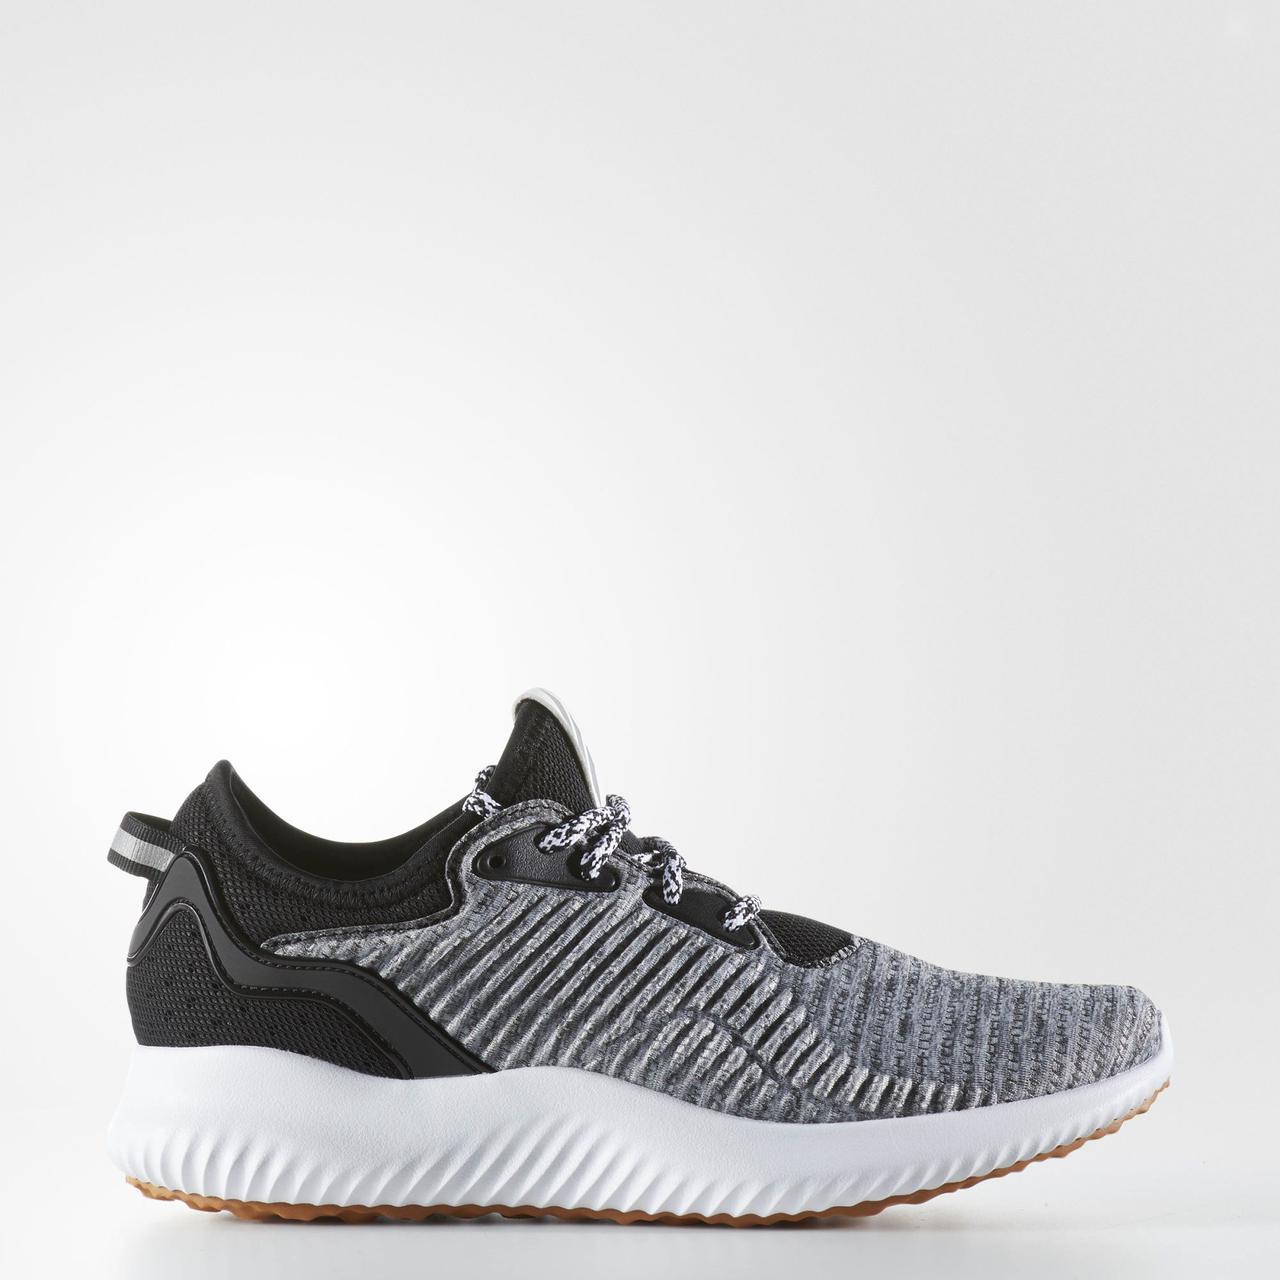 0e9857c8 Кроссовки Adidas Alphabounce Lux W BY4250 (Оригинал ) -